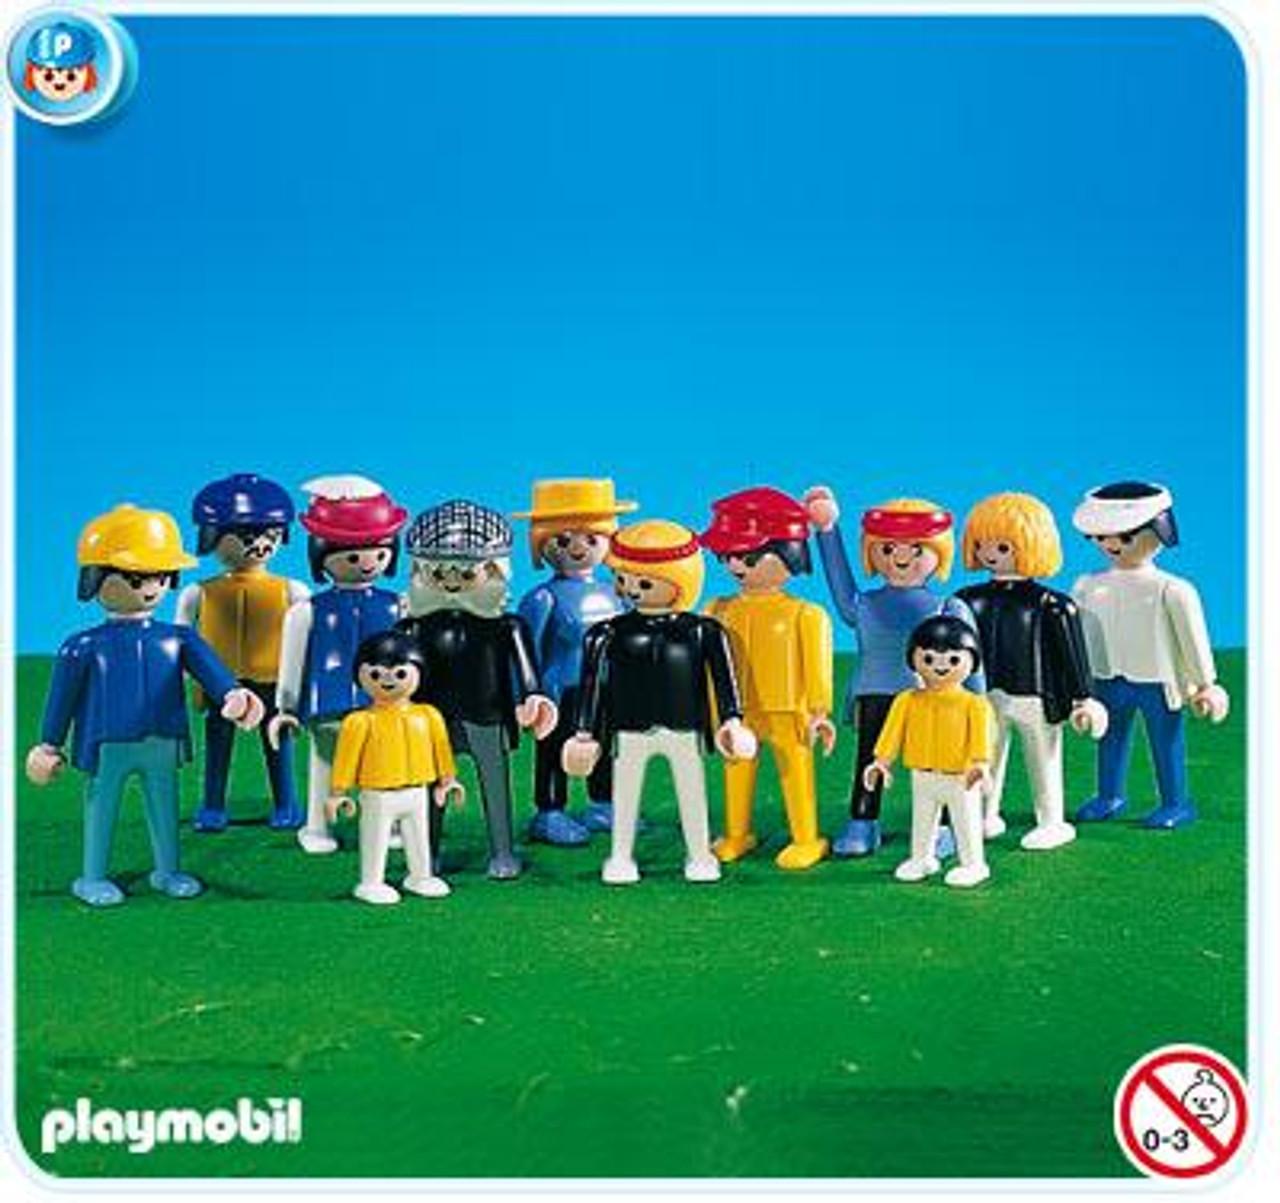 Playmobil Suburban Life 12 Random Figures Set #7128